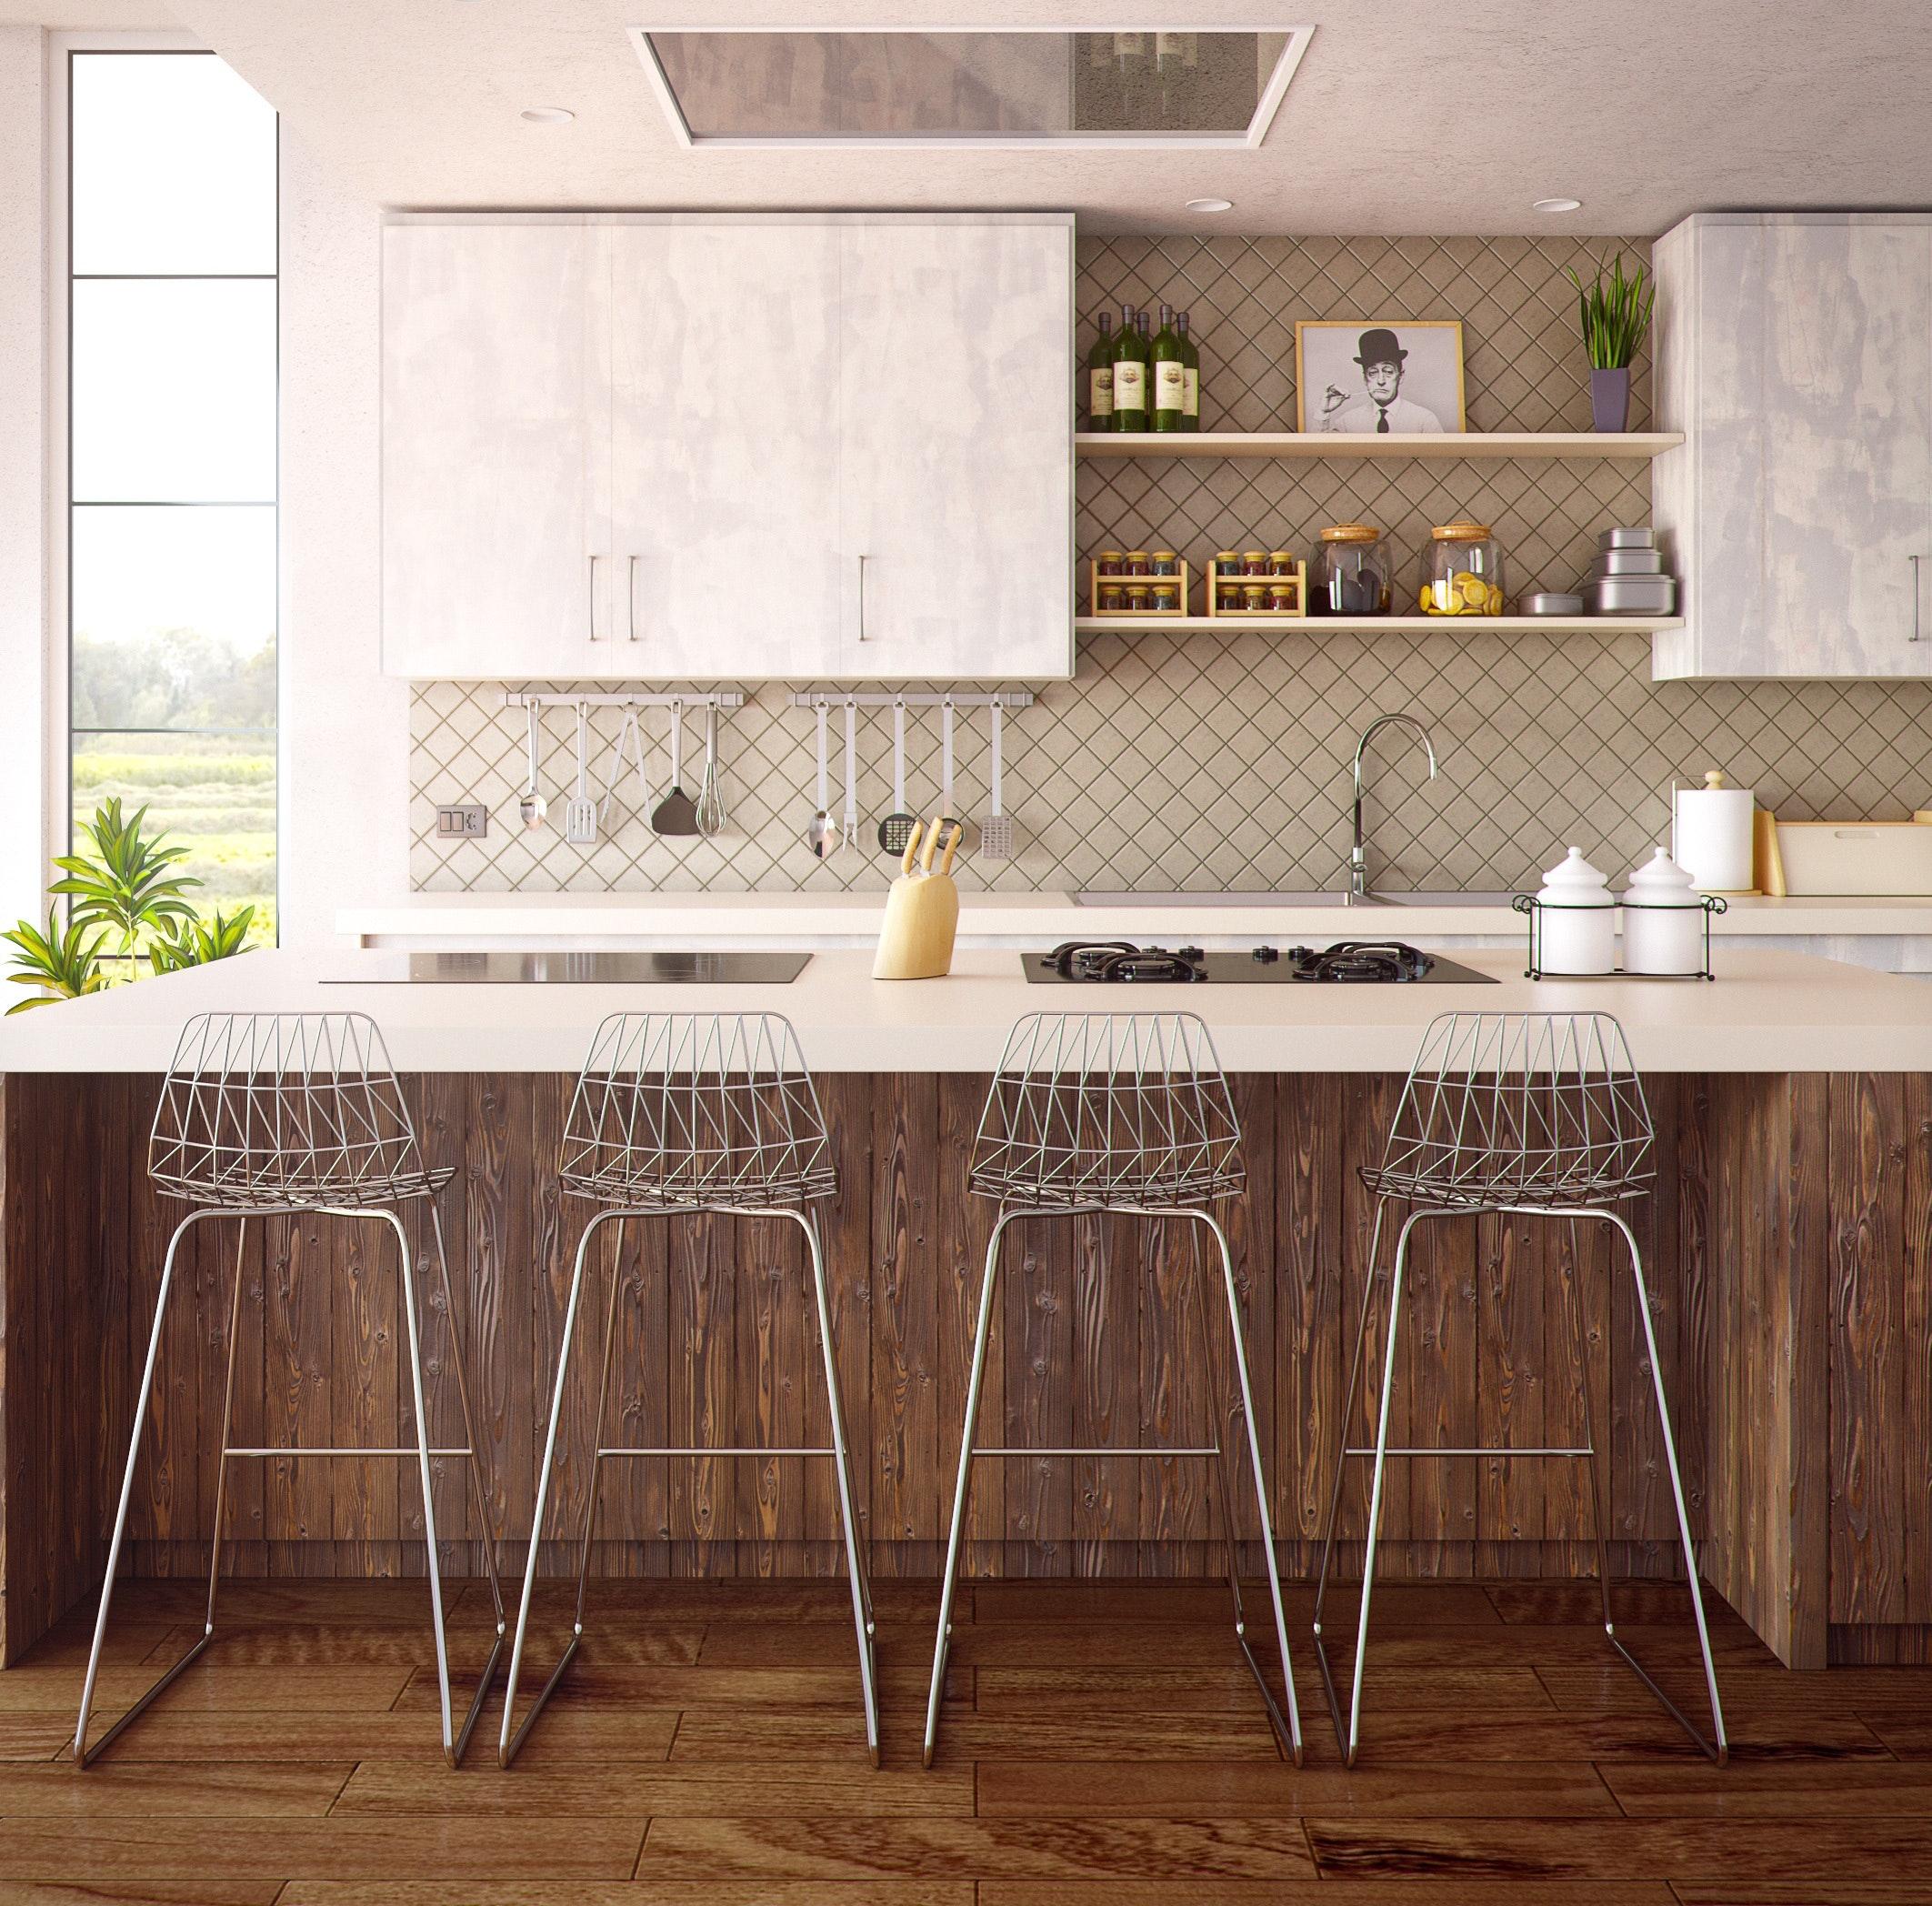 architecture-backsplash-chairs-279648.jpg